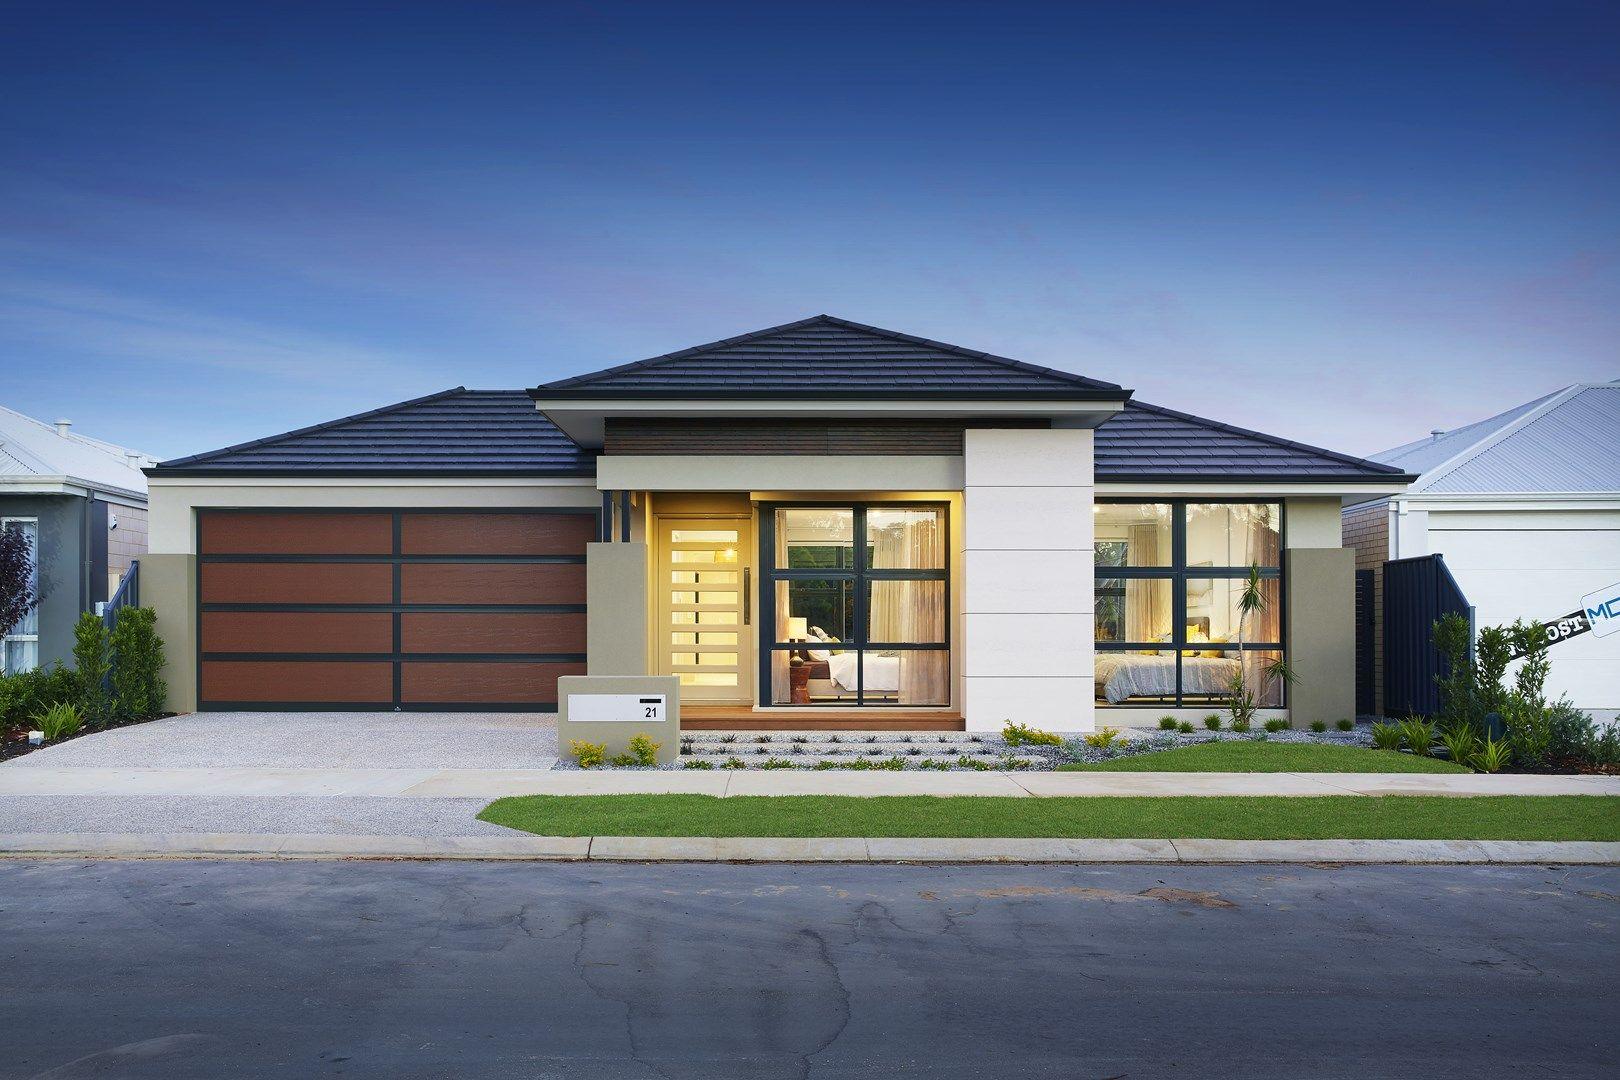 Aveley wa 6069 4 beds house for sale from 442856 2014124455 aveley wa 6069 image 0 malvernweather Choice Image